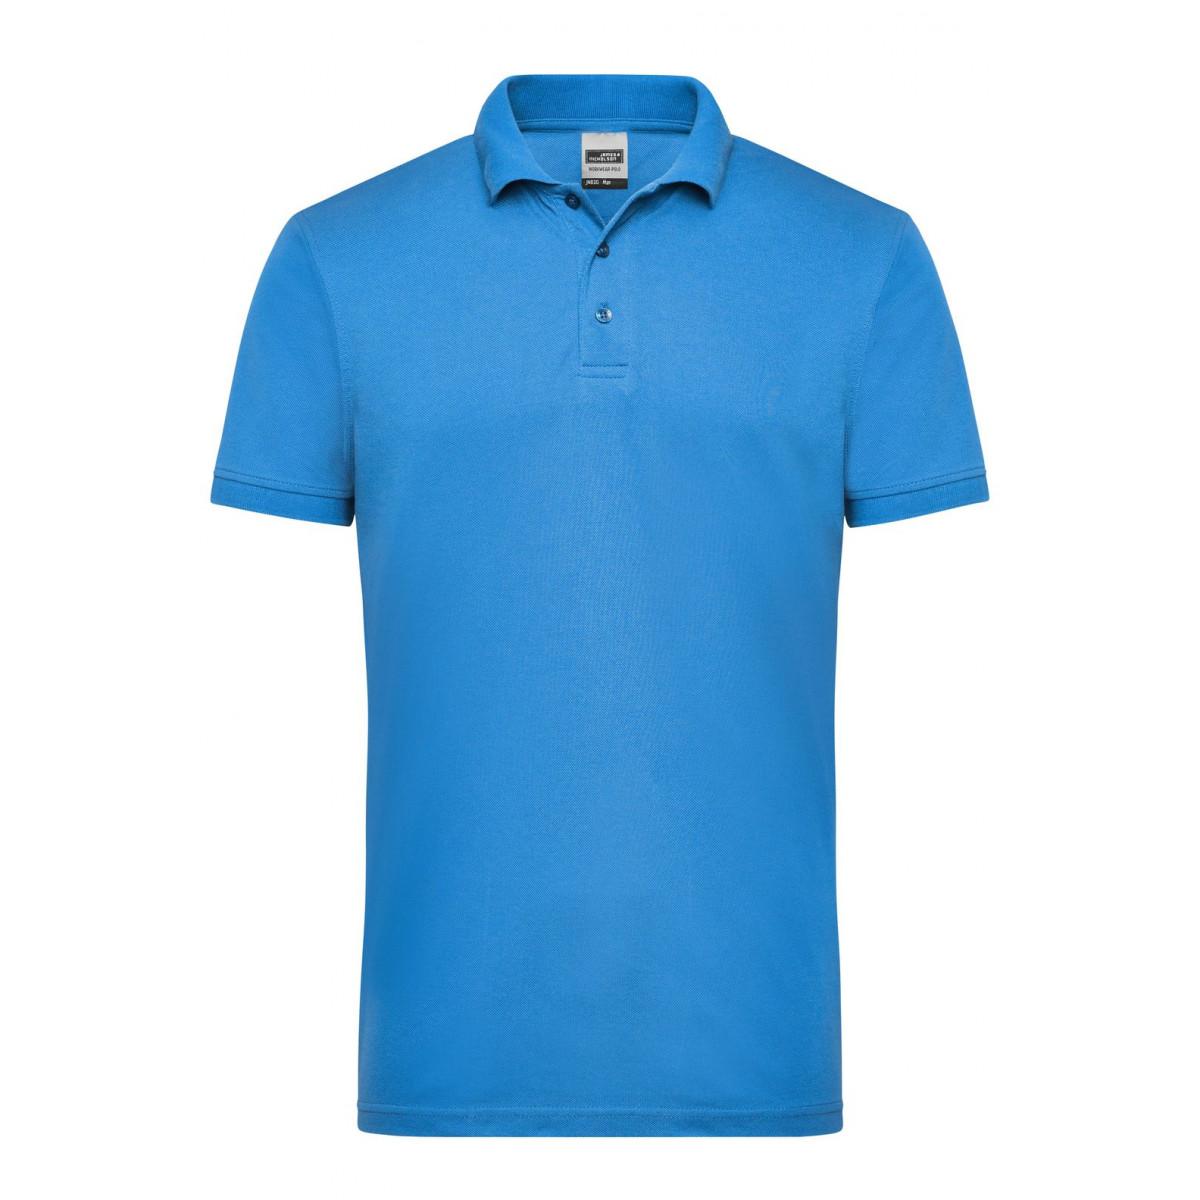 Рубашка поло мужская JN830 Mens Workwear Polo - Аква